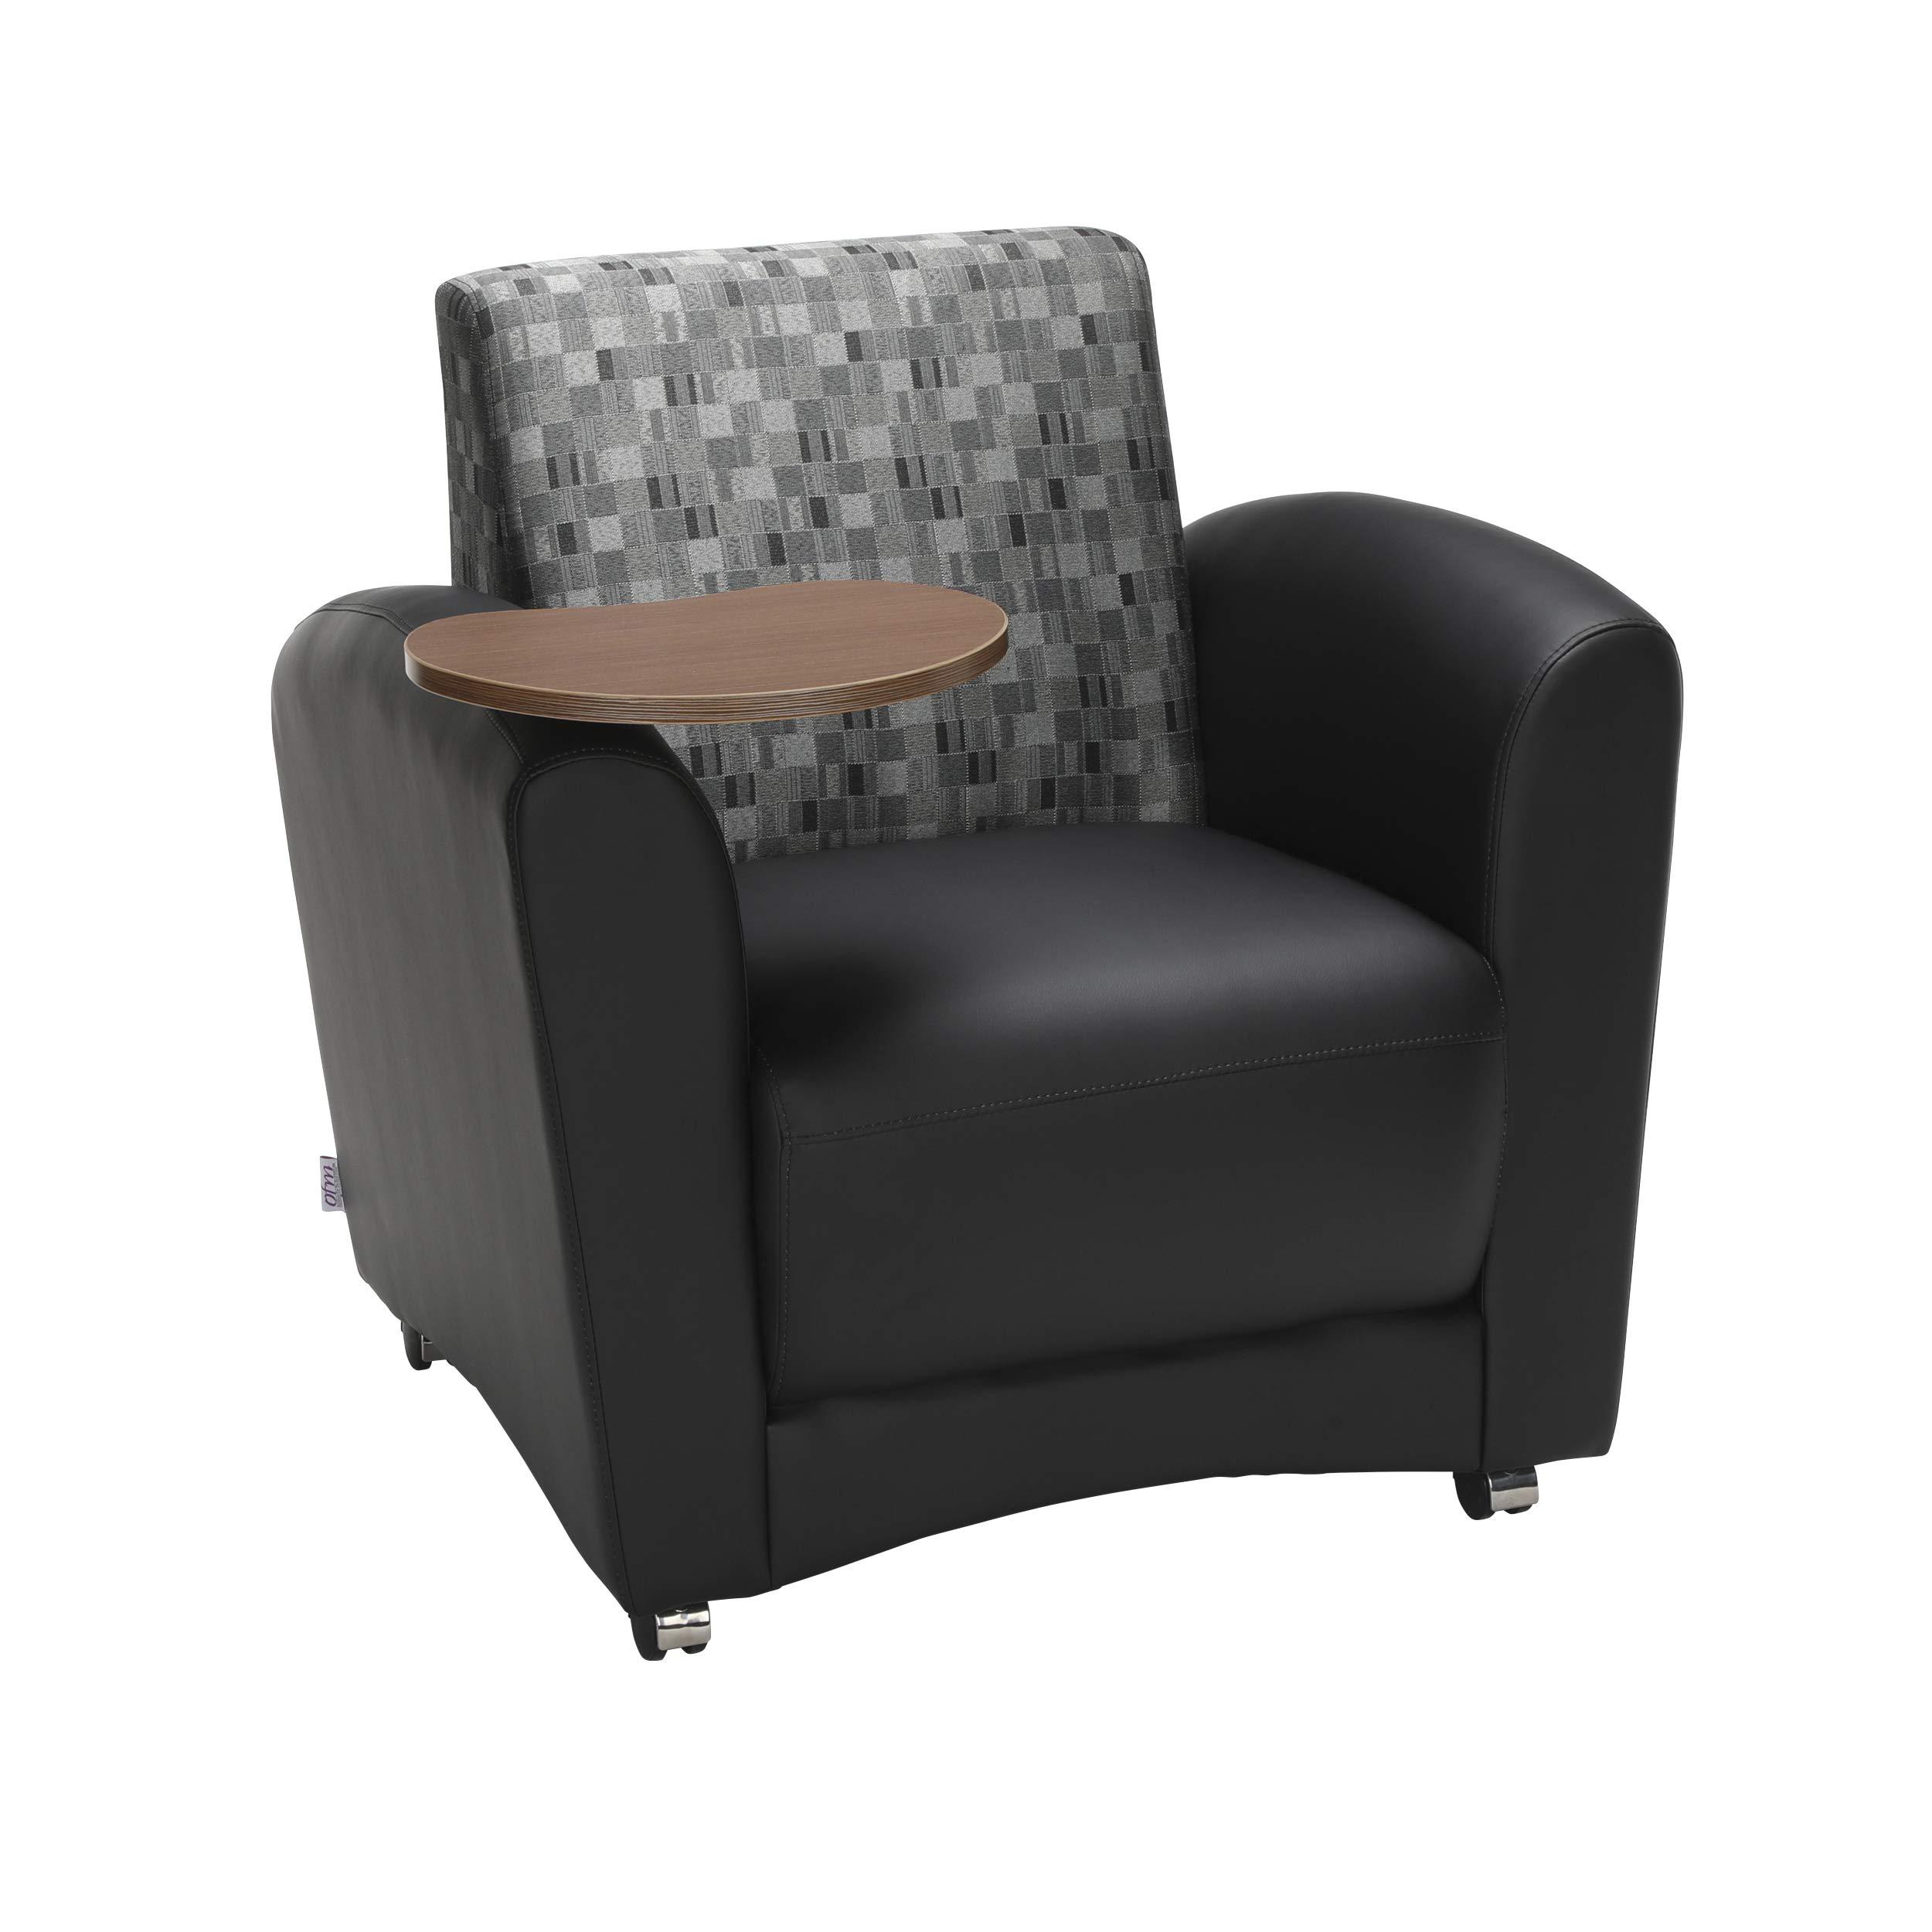 OFM InterPlay Series Single Seat Chair with Bronze Tablet, in Black/Nickel (821-N-606-BRONZ)